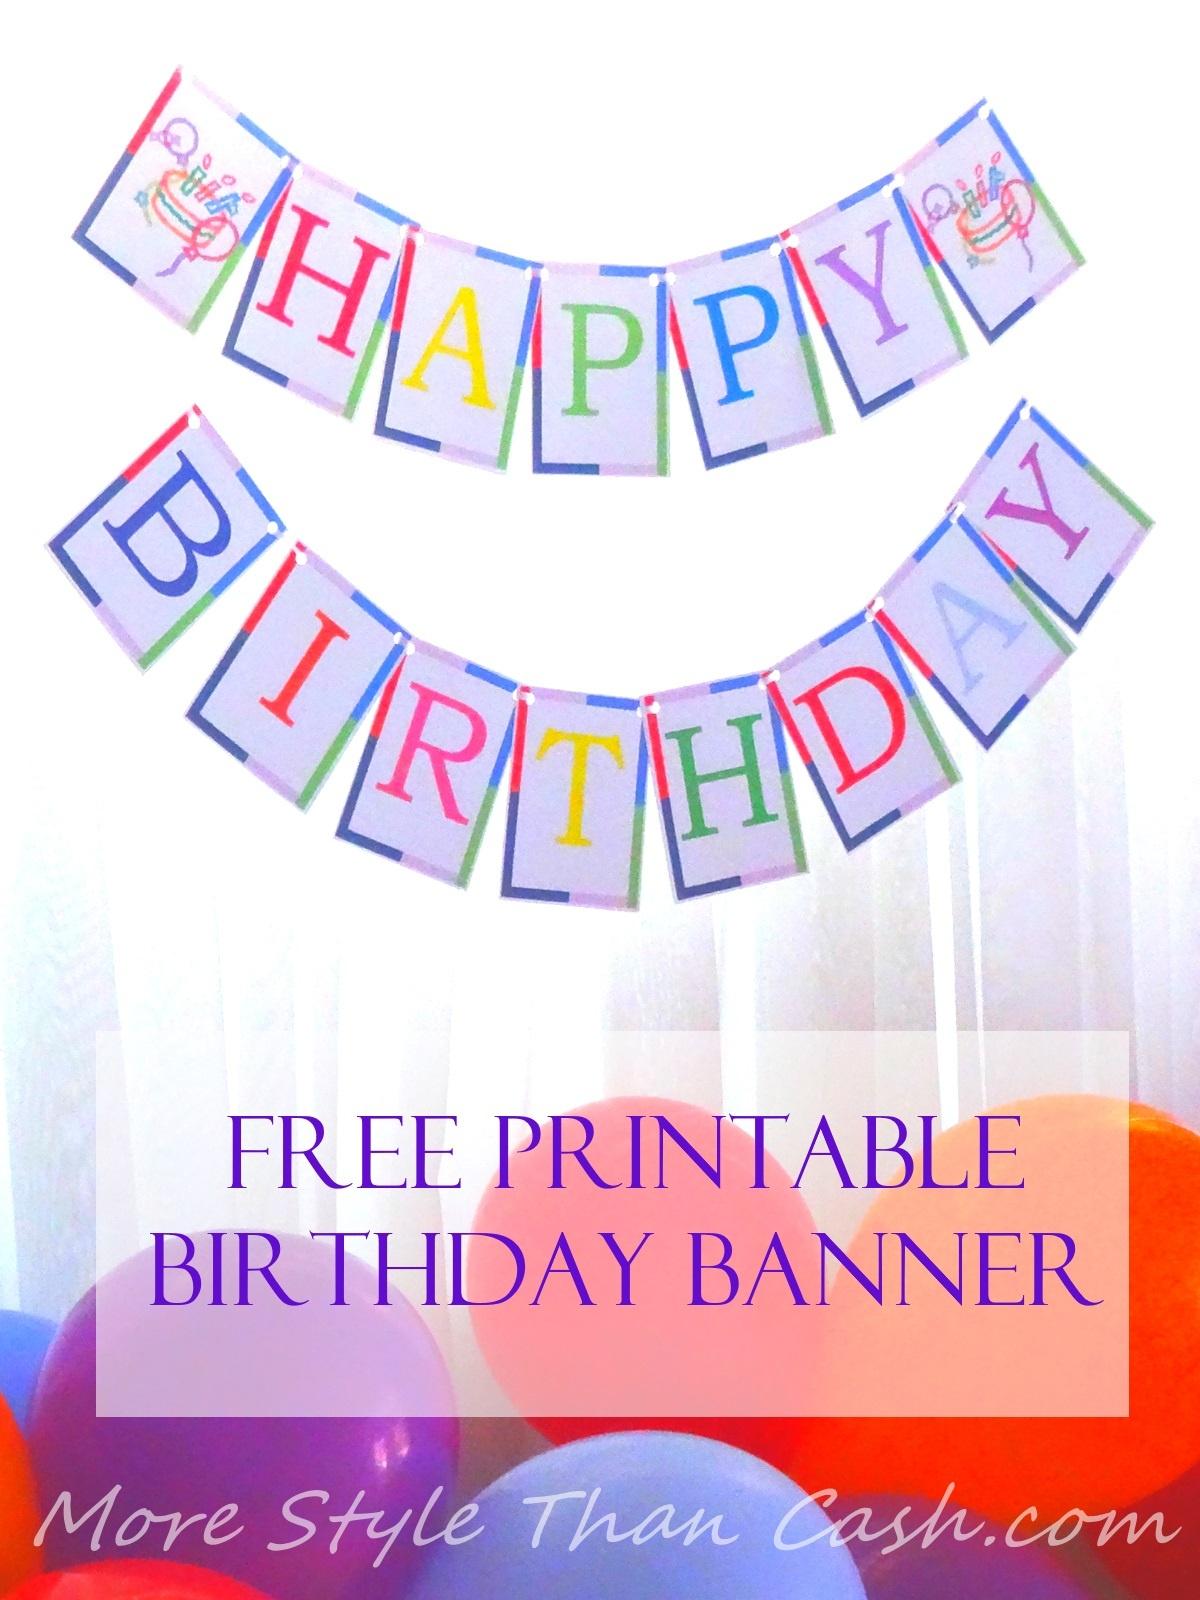 Free Printable Birthday Banner - Free Happy Birthday Banner Printable Pdf